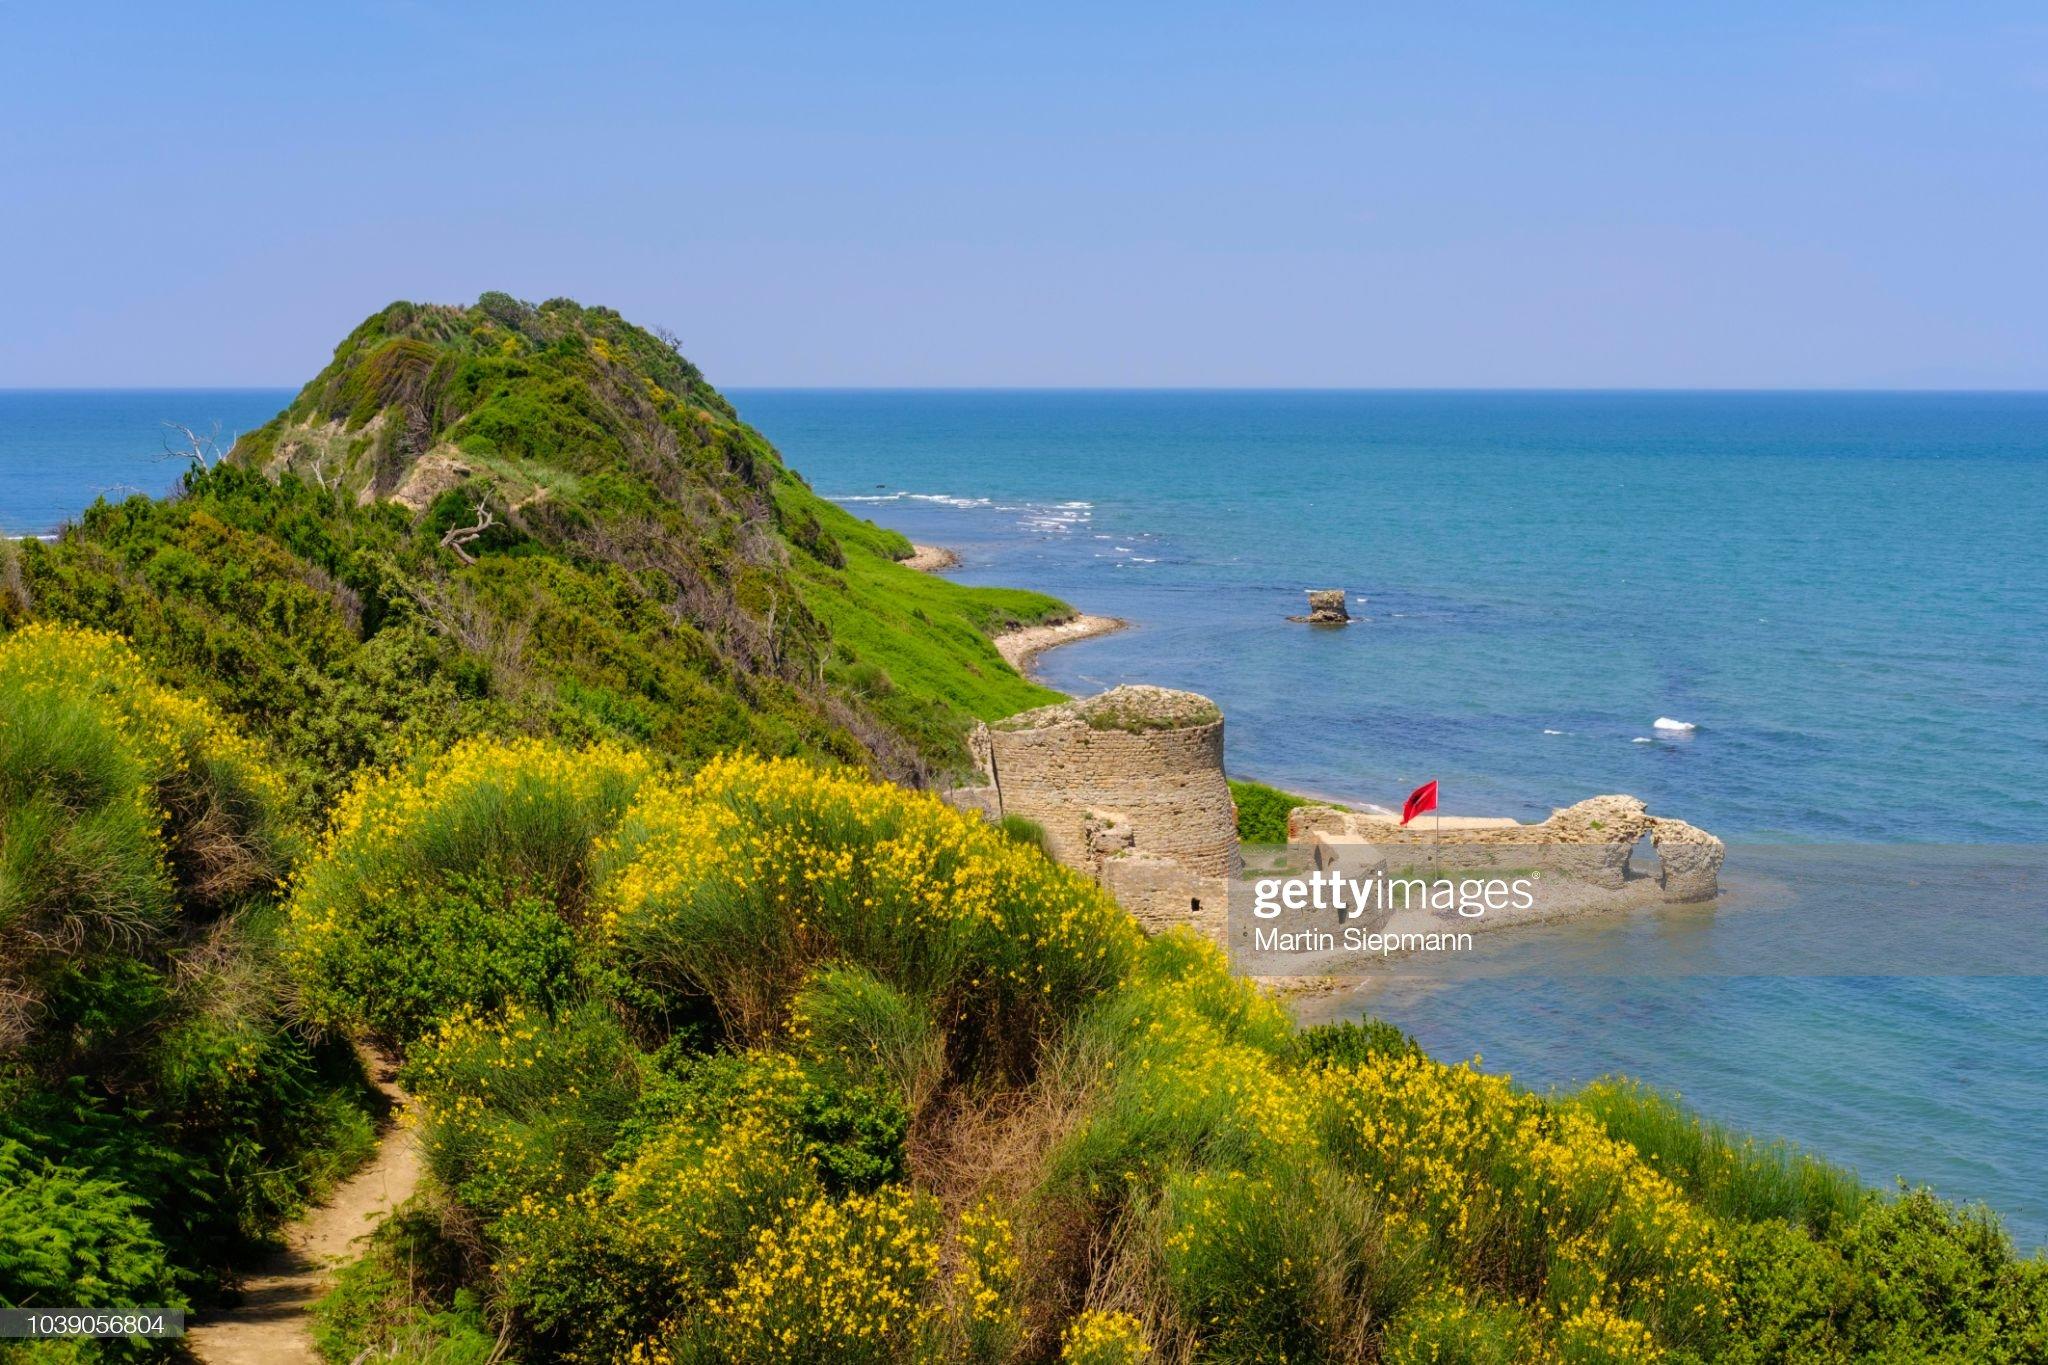 Fortress of Skanderbeg, Cape Rodon, Kepi i Rodonit, Adriatic, Ishem, Durres, Durres, Albania : Stock Photo